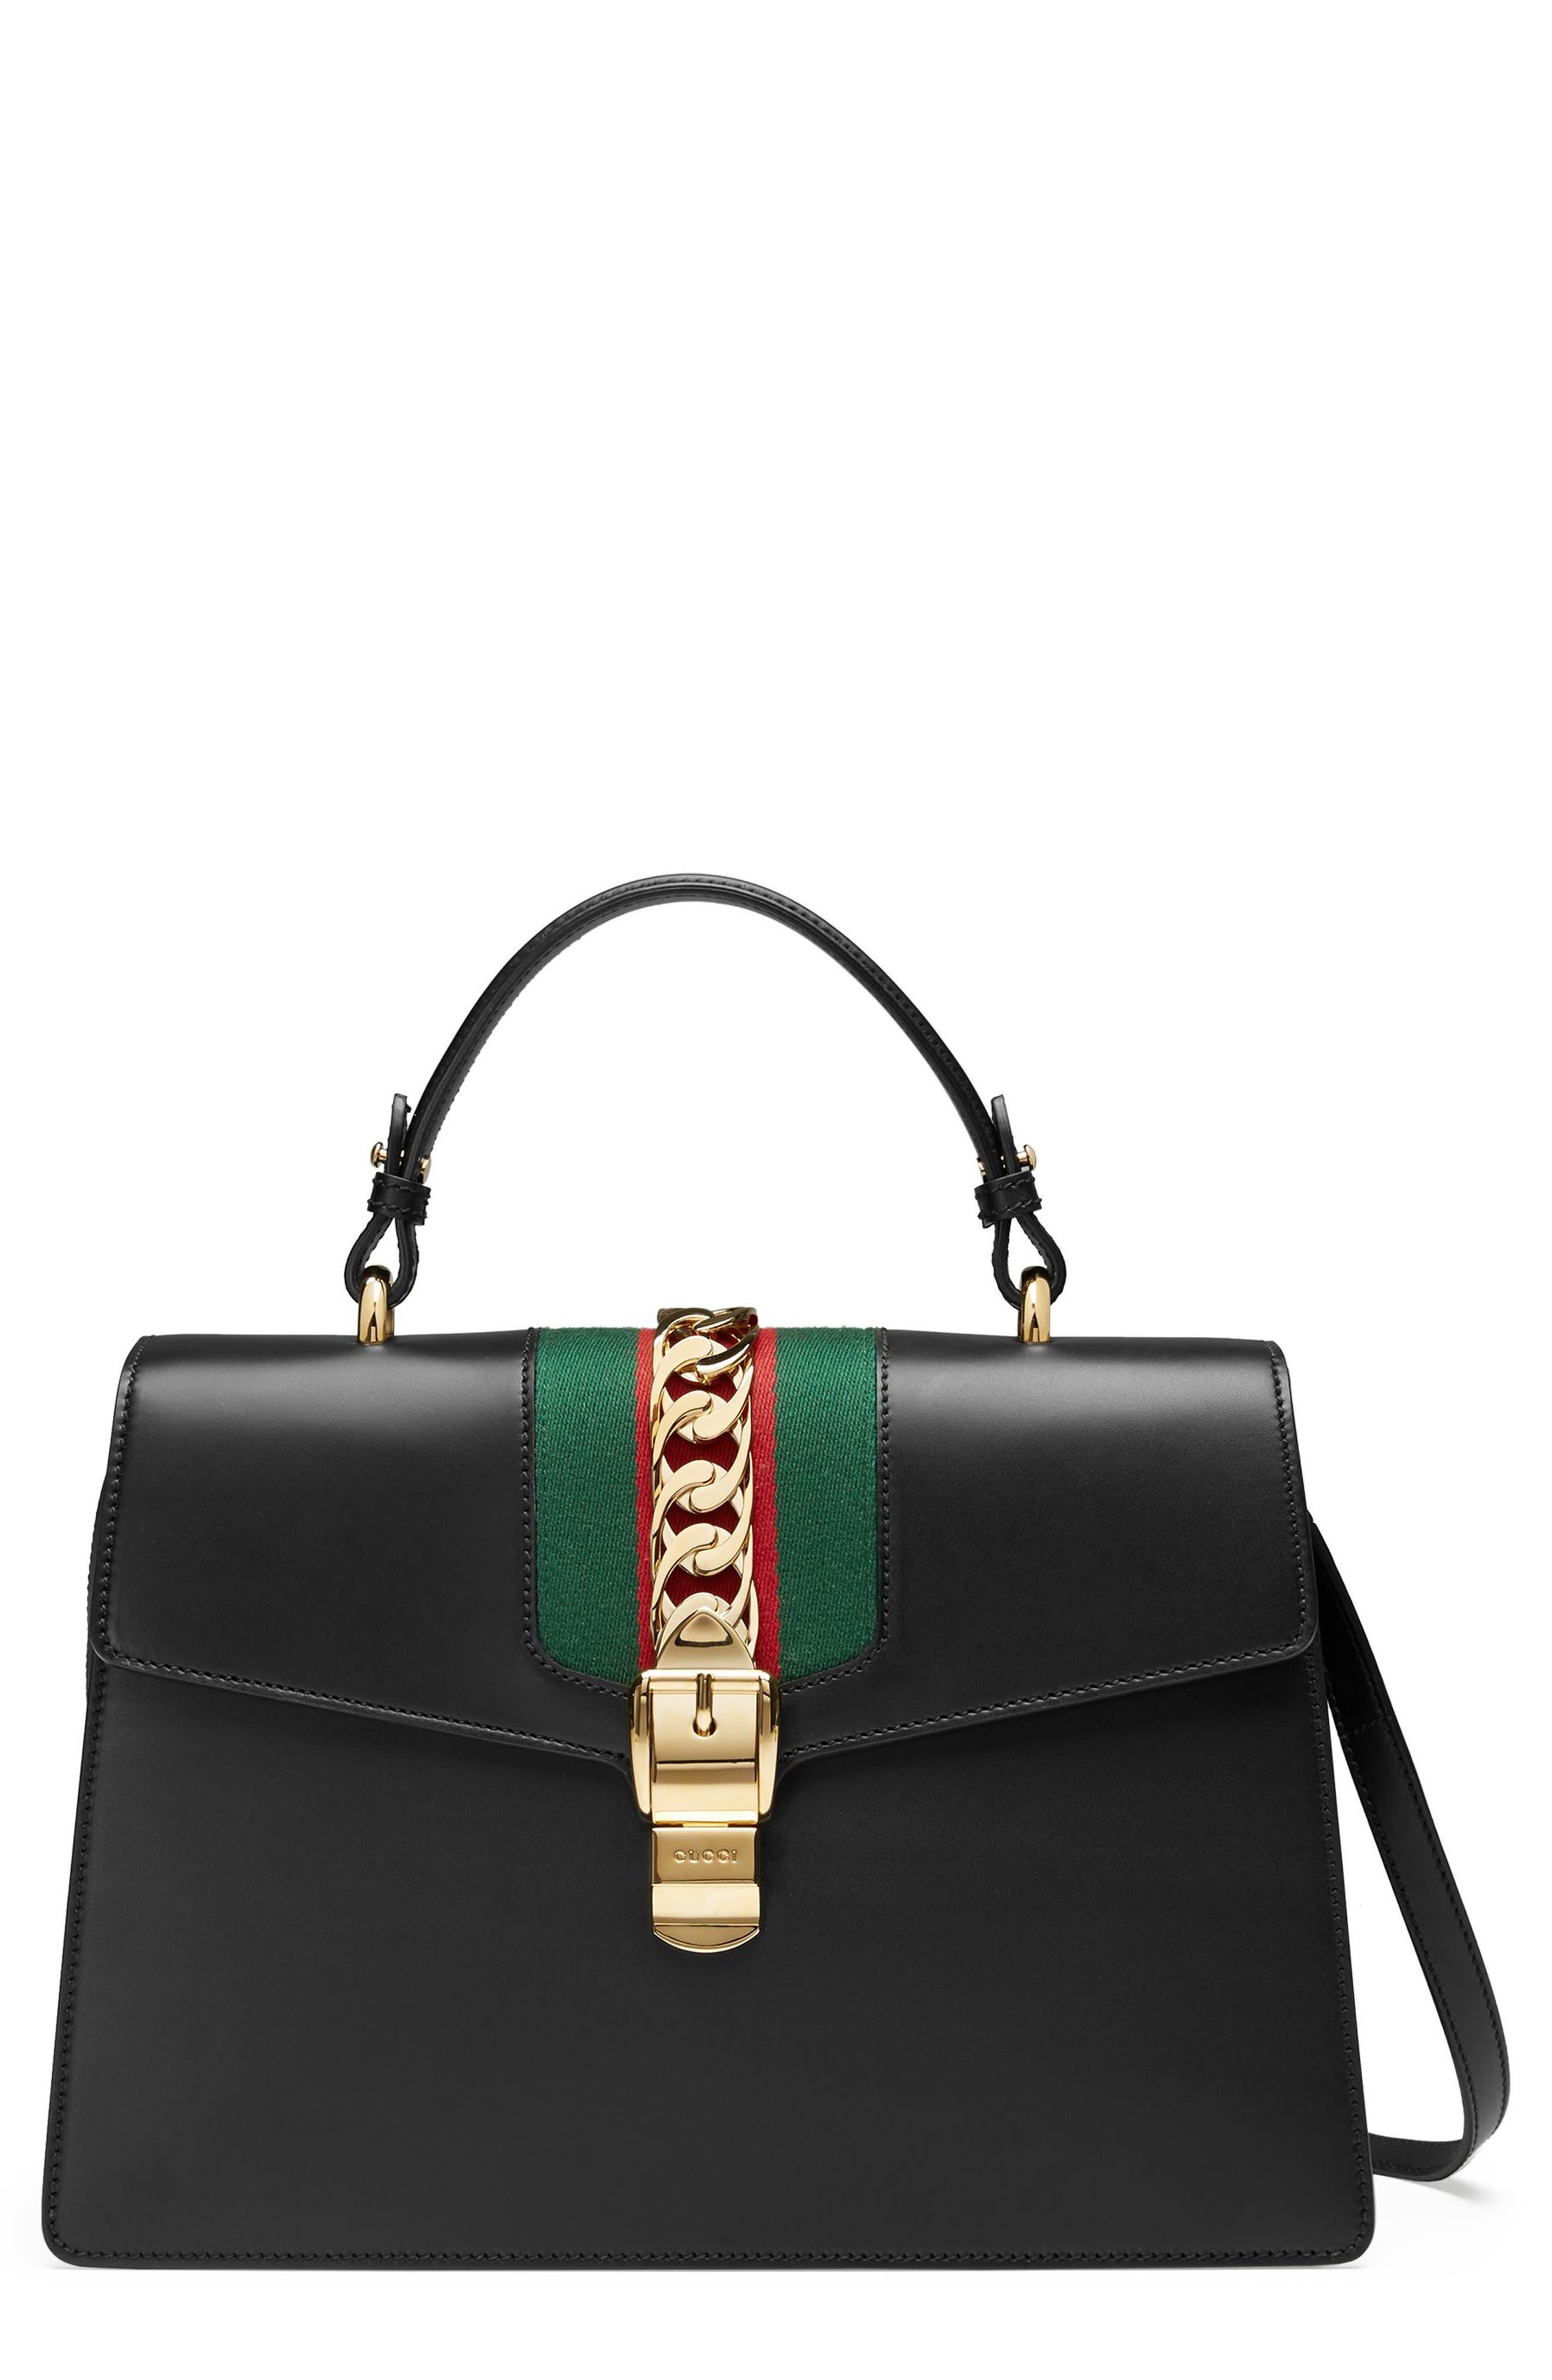 Sylvie Top Handle Leather Shoulder Bag,                         Main,                         color, NERO/VRV